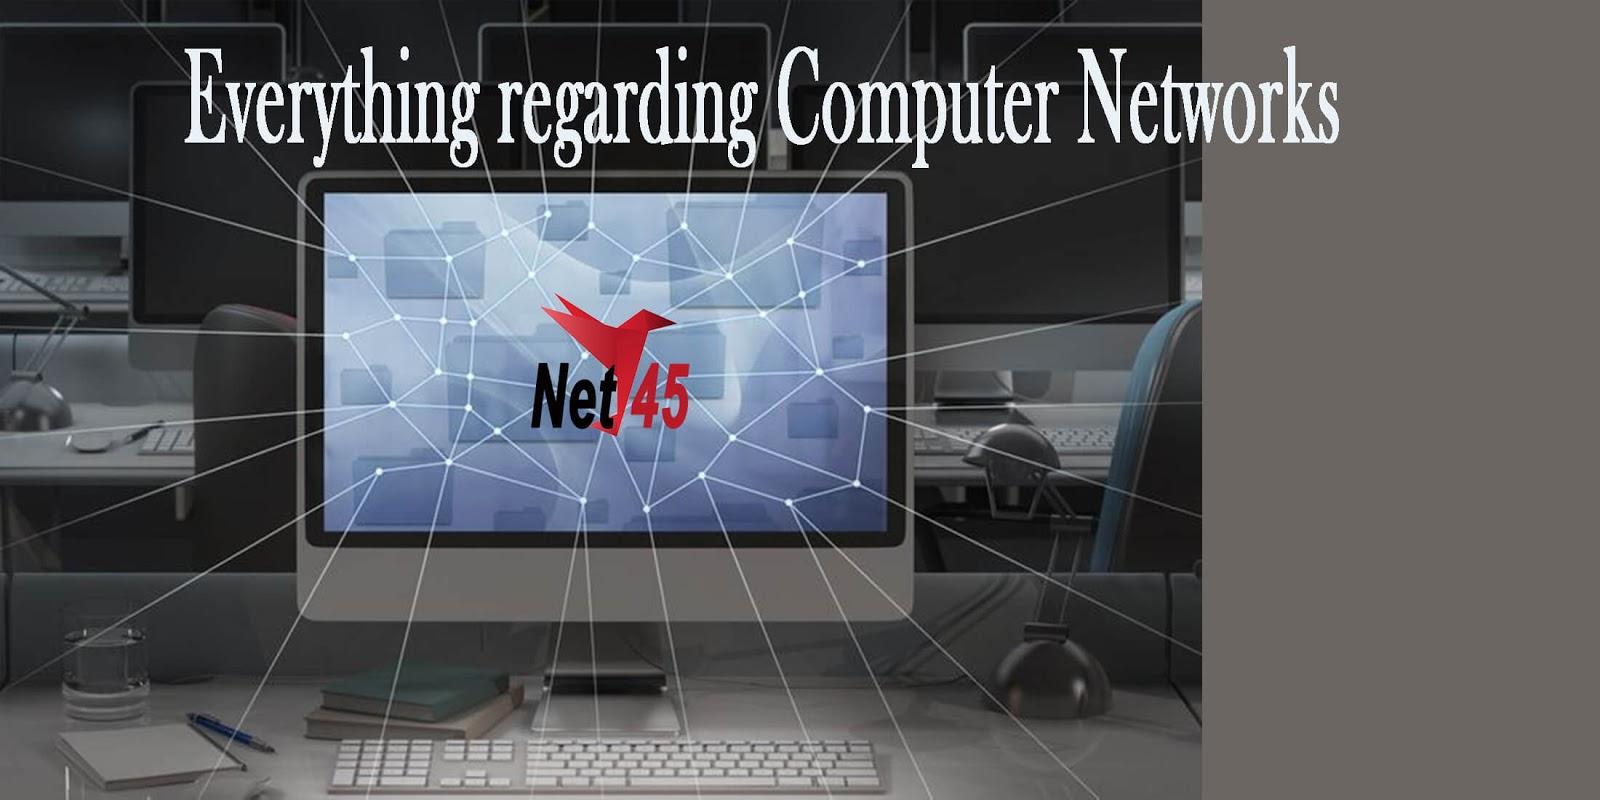 computer networks tan, advantages of comput, first computer network, whats a computer network, computer networks basics, co network